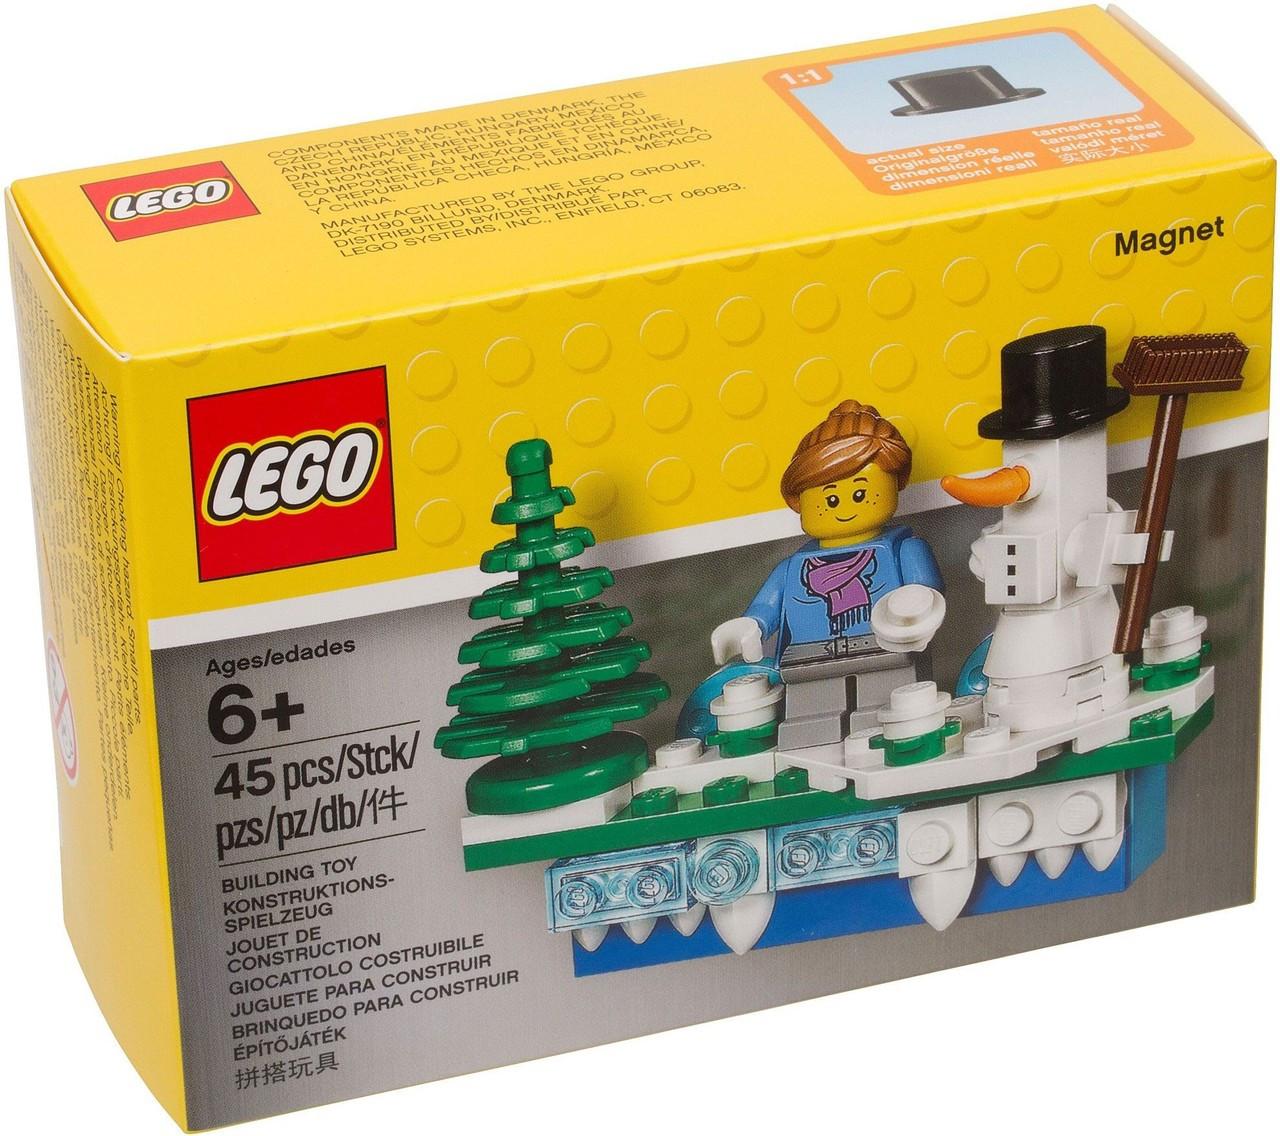 Bagged LEGO Seasonal Bat Halloween Set 40014 Toy